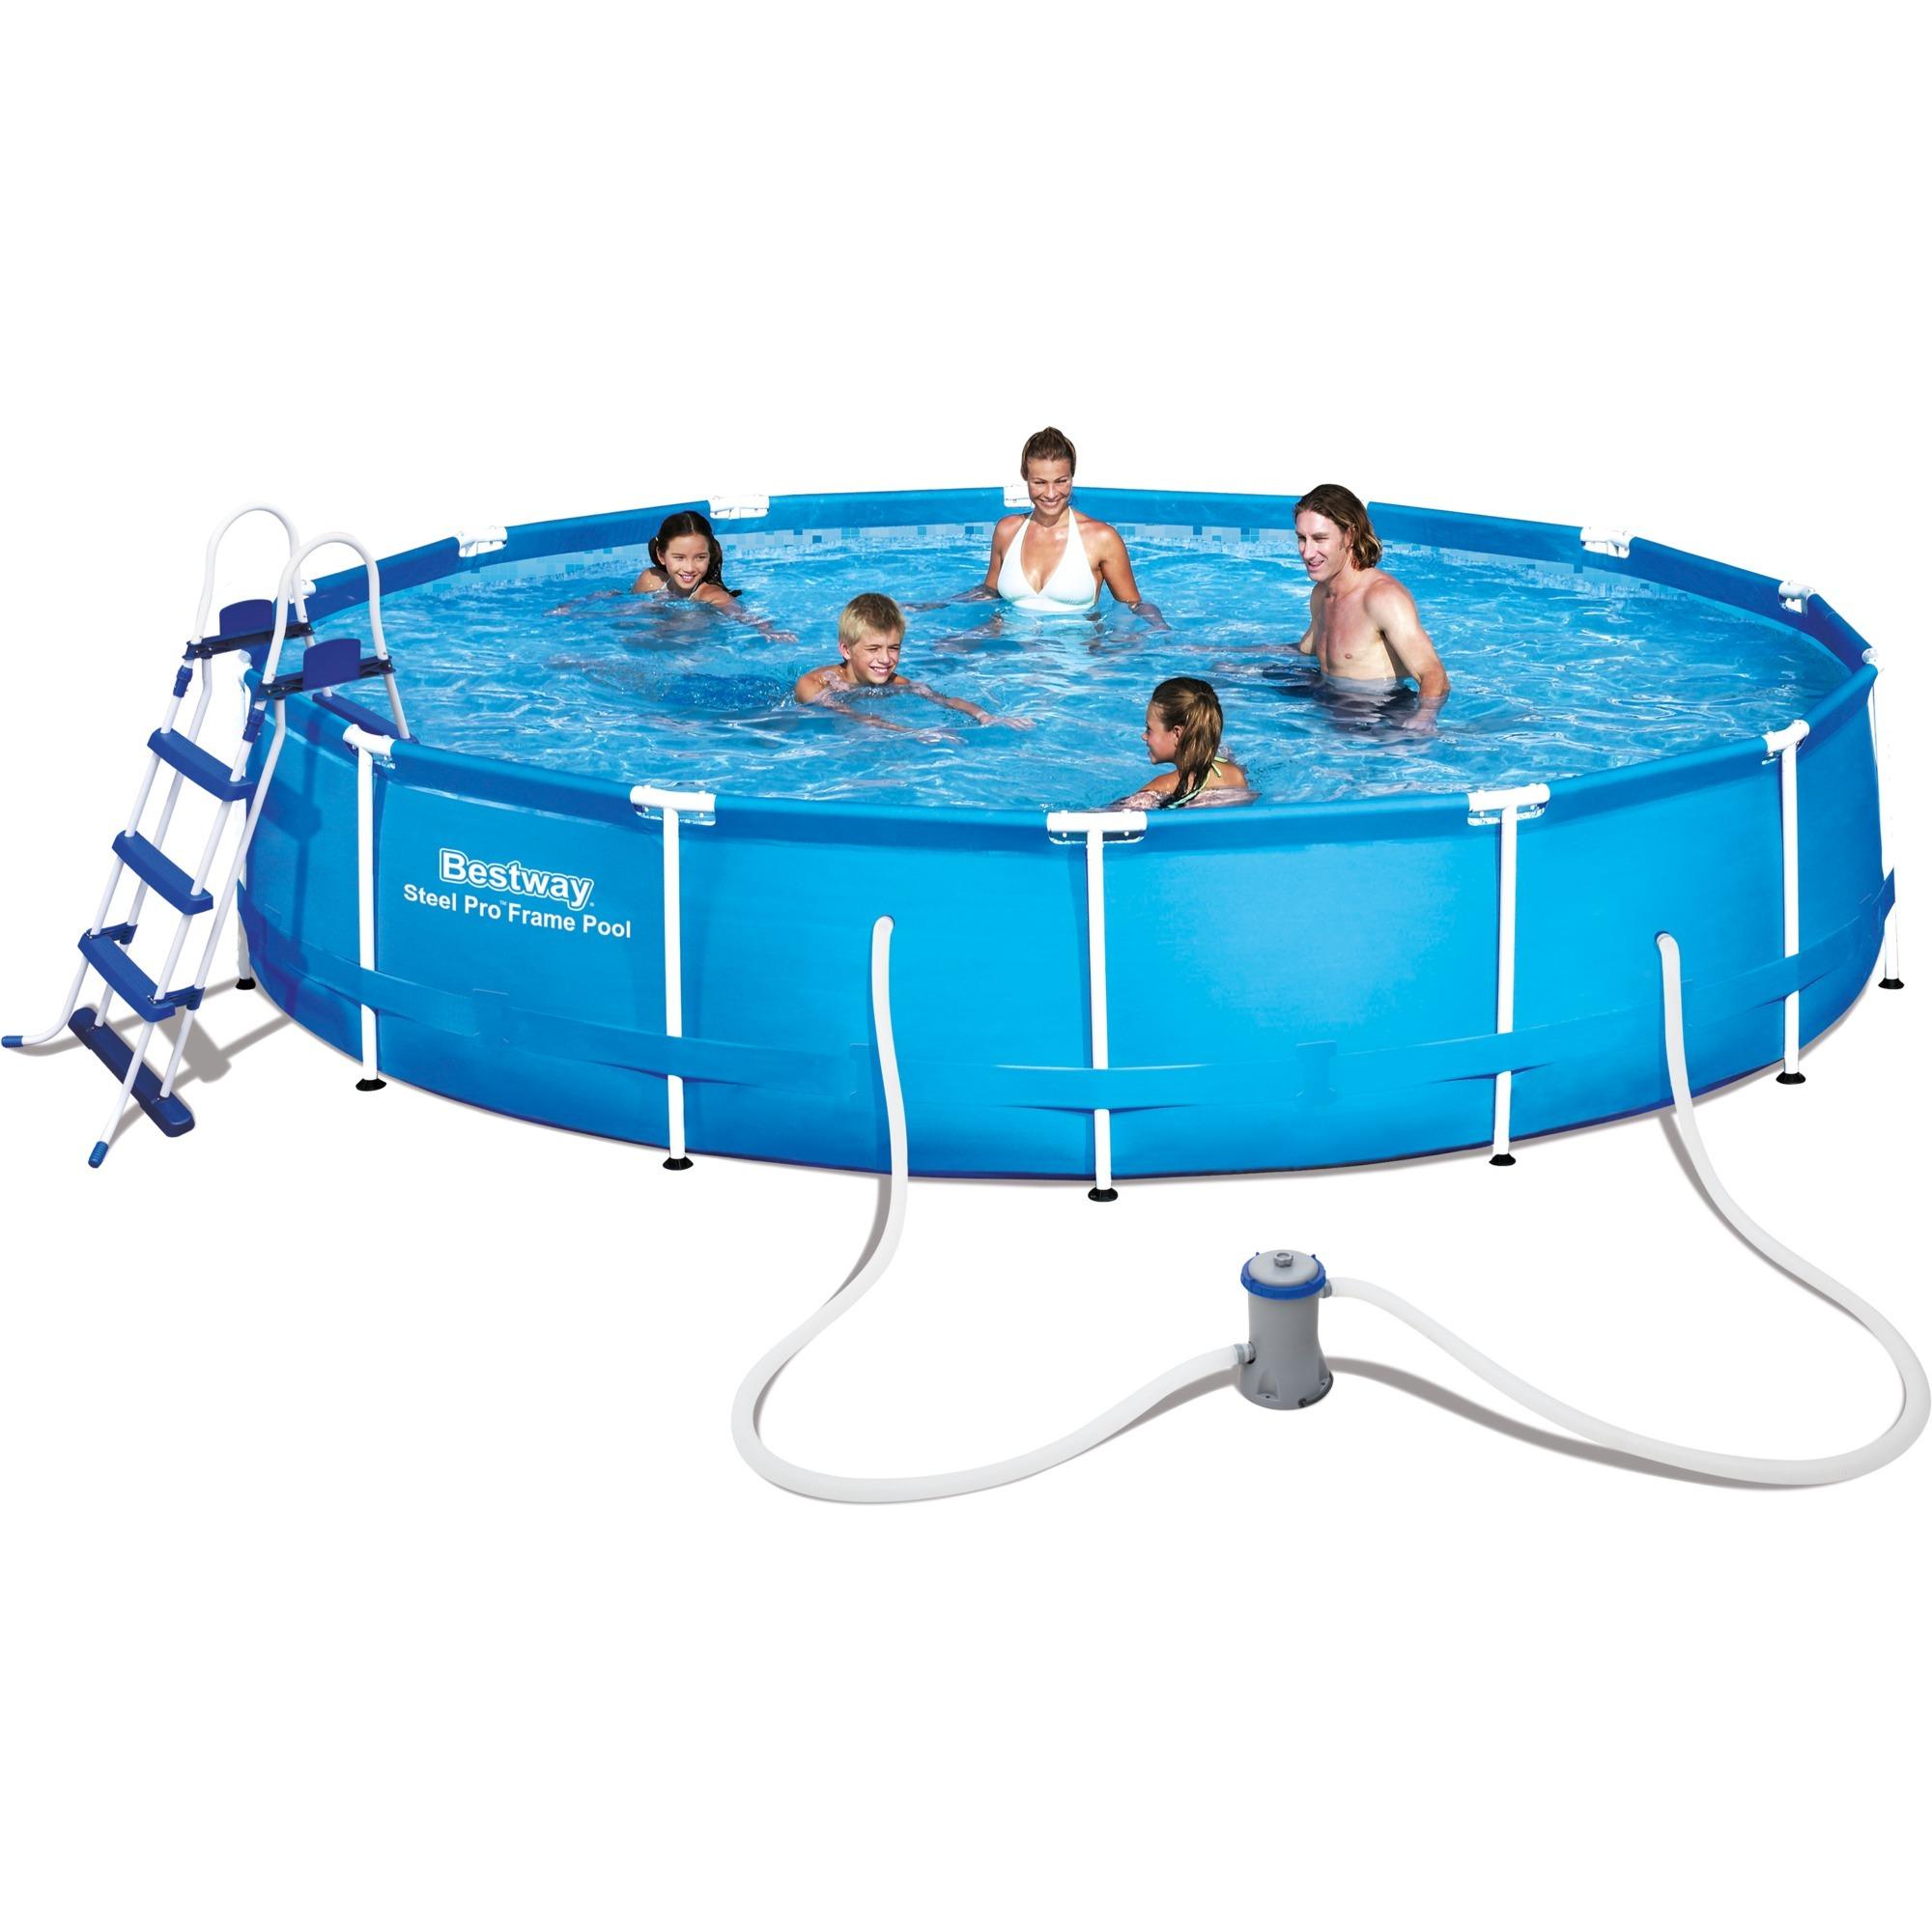 Bestway piscina rana fish me 107x104x71 prezzi sconti scp - Piscina bestway opinioni ...